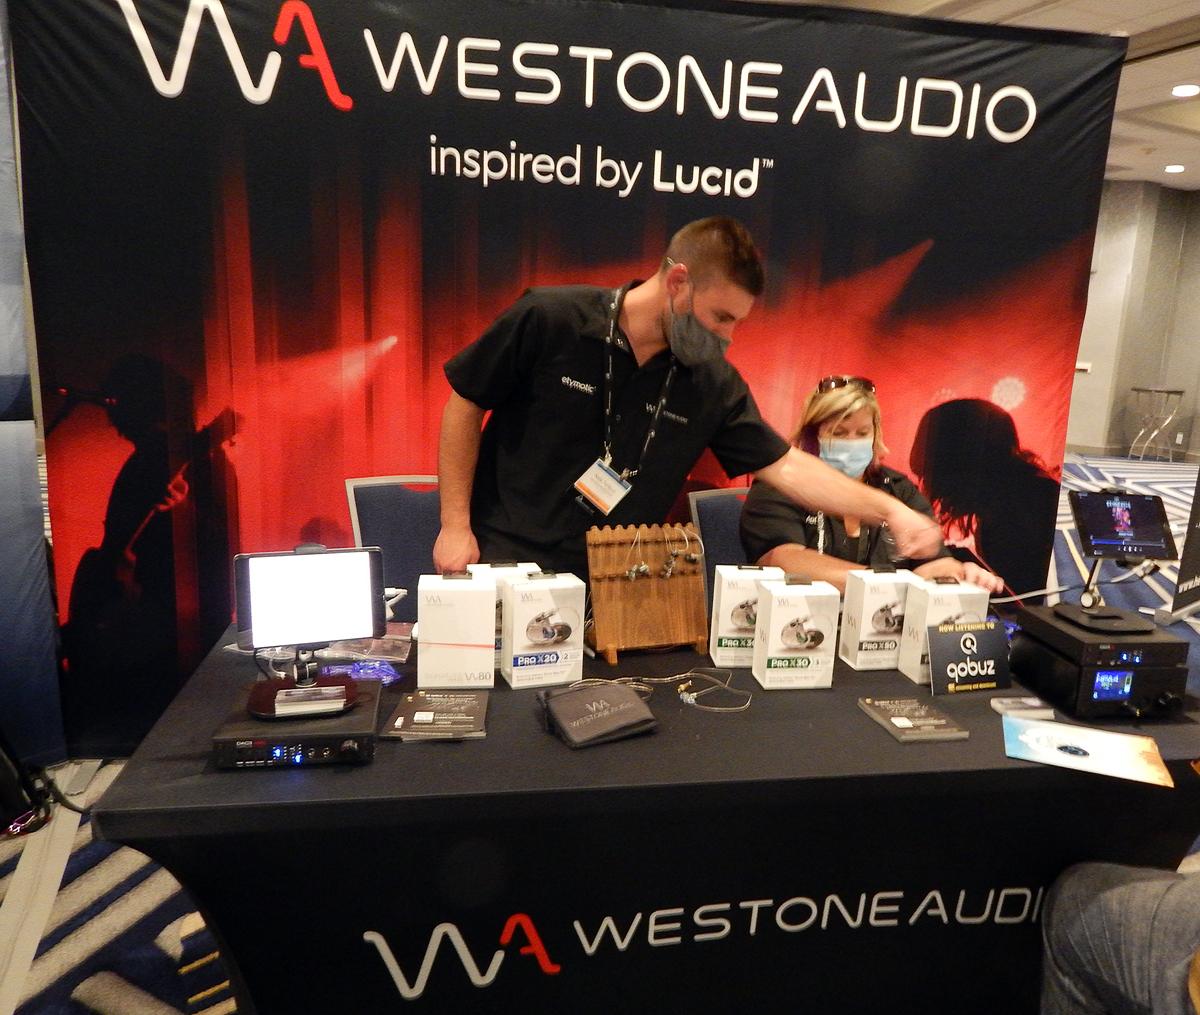 Westone Audio CanJam SoCal 2021